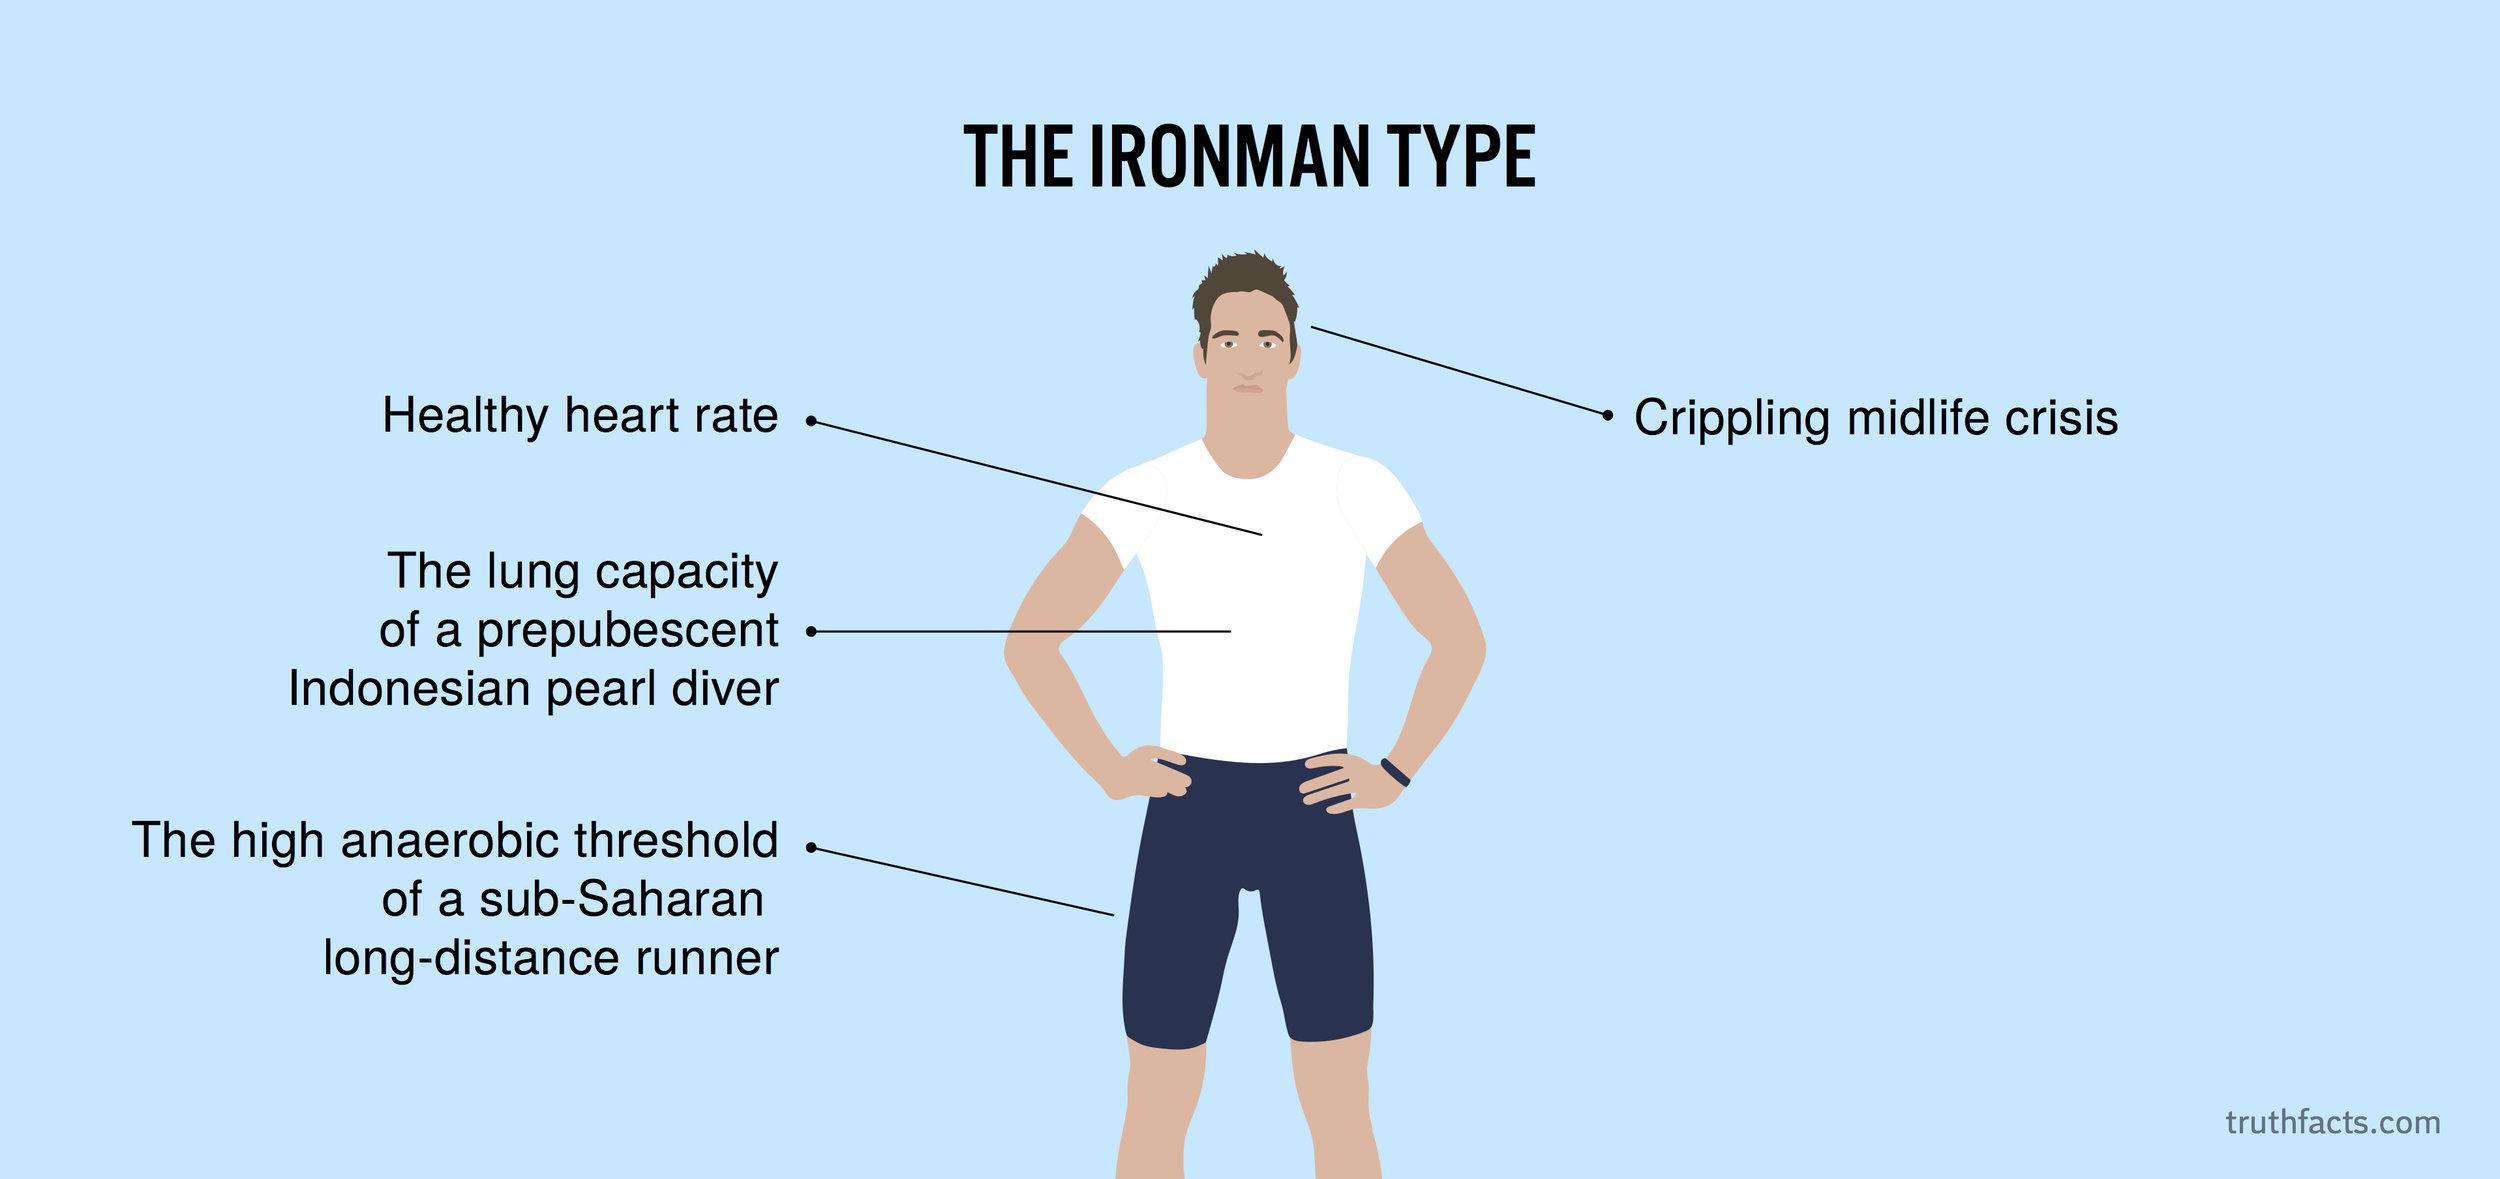 The ironman type